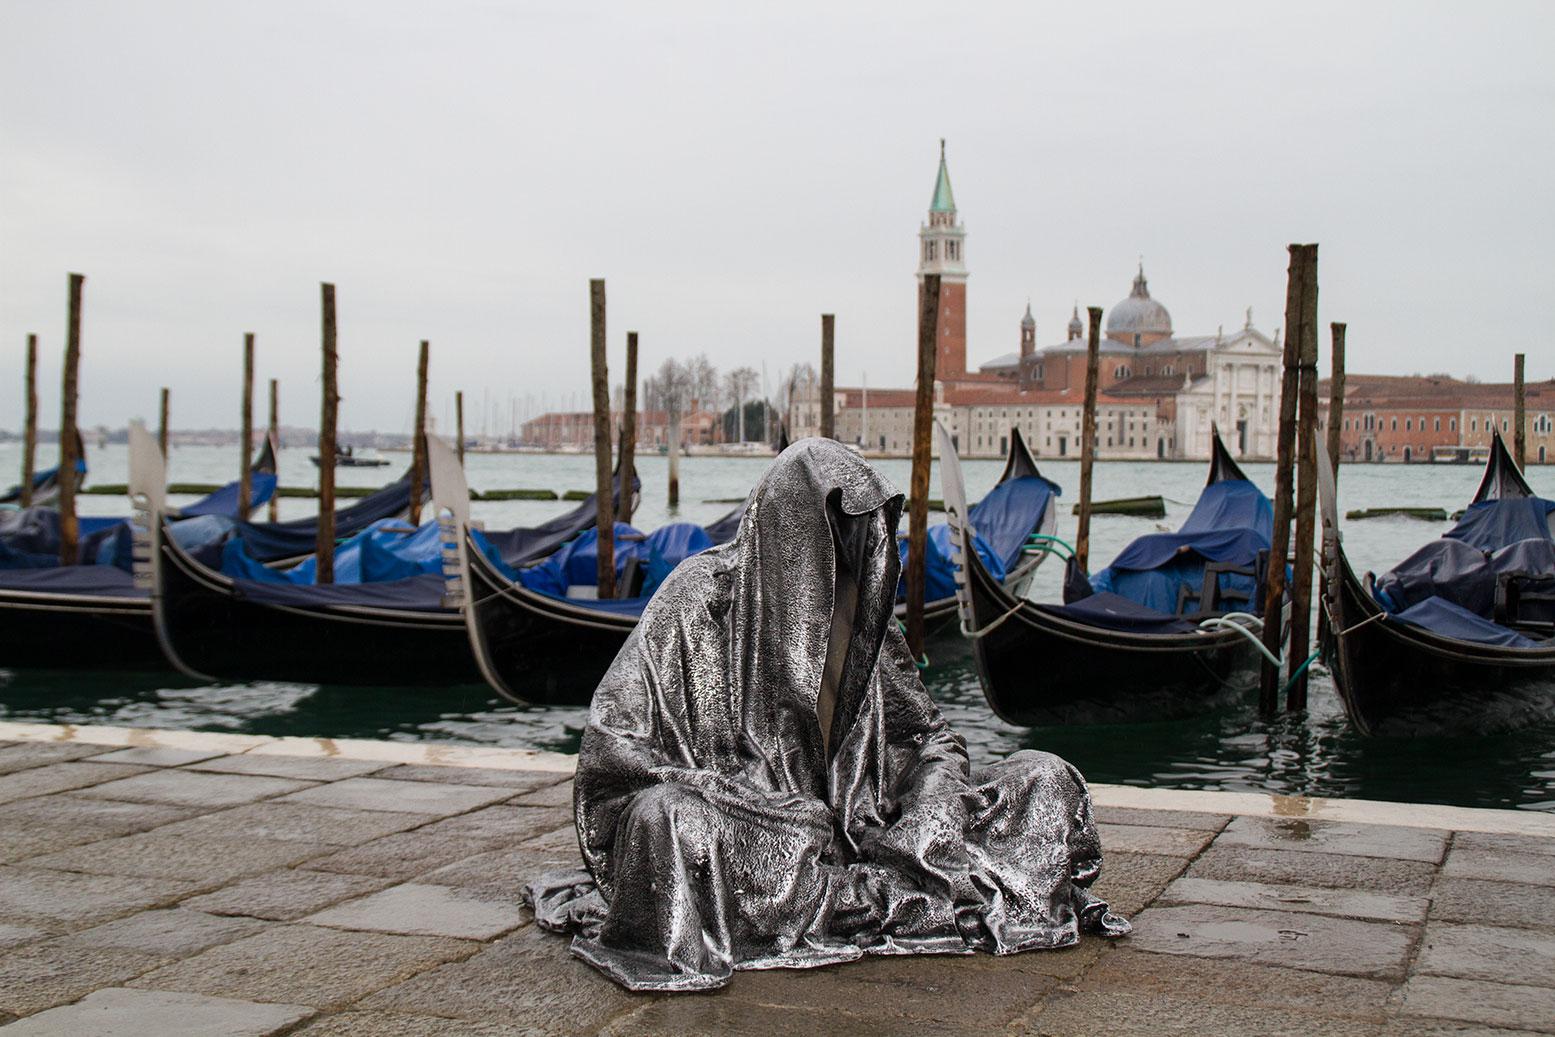 Biennale 2015 hotel cris for Artisti biennale venezia